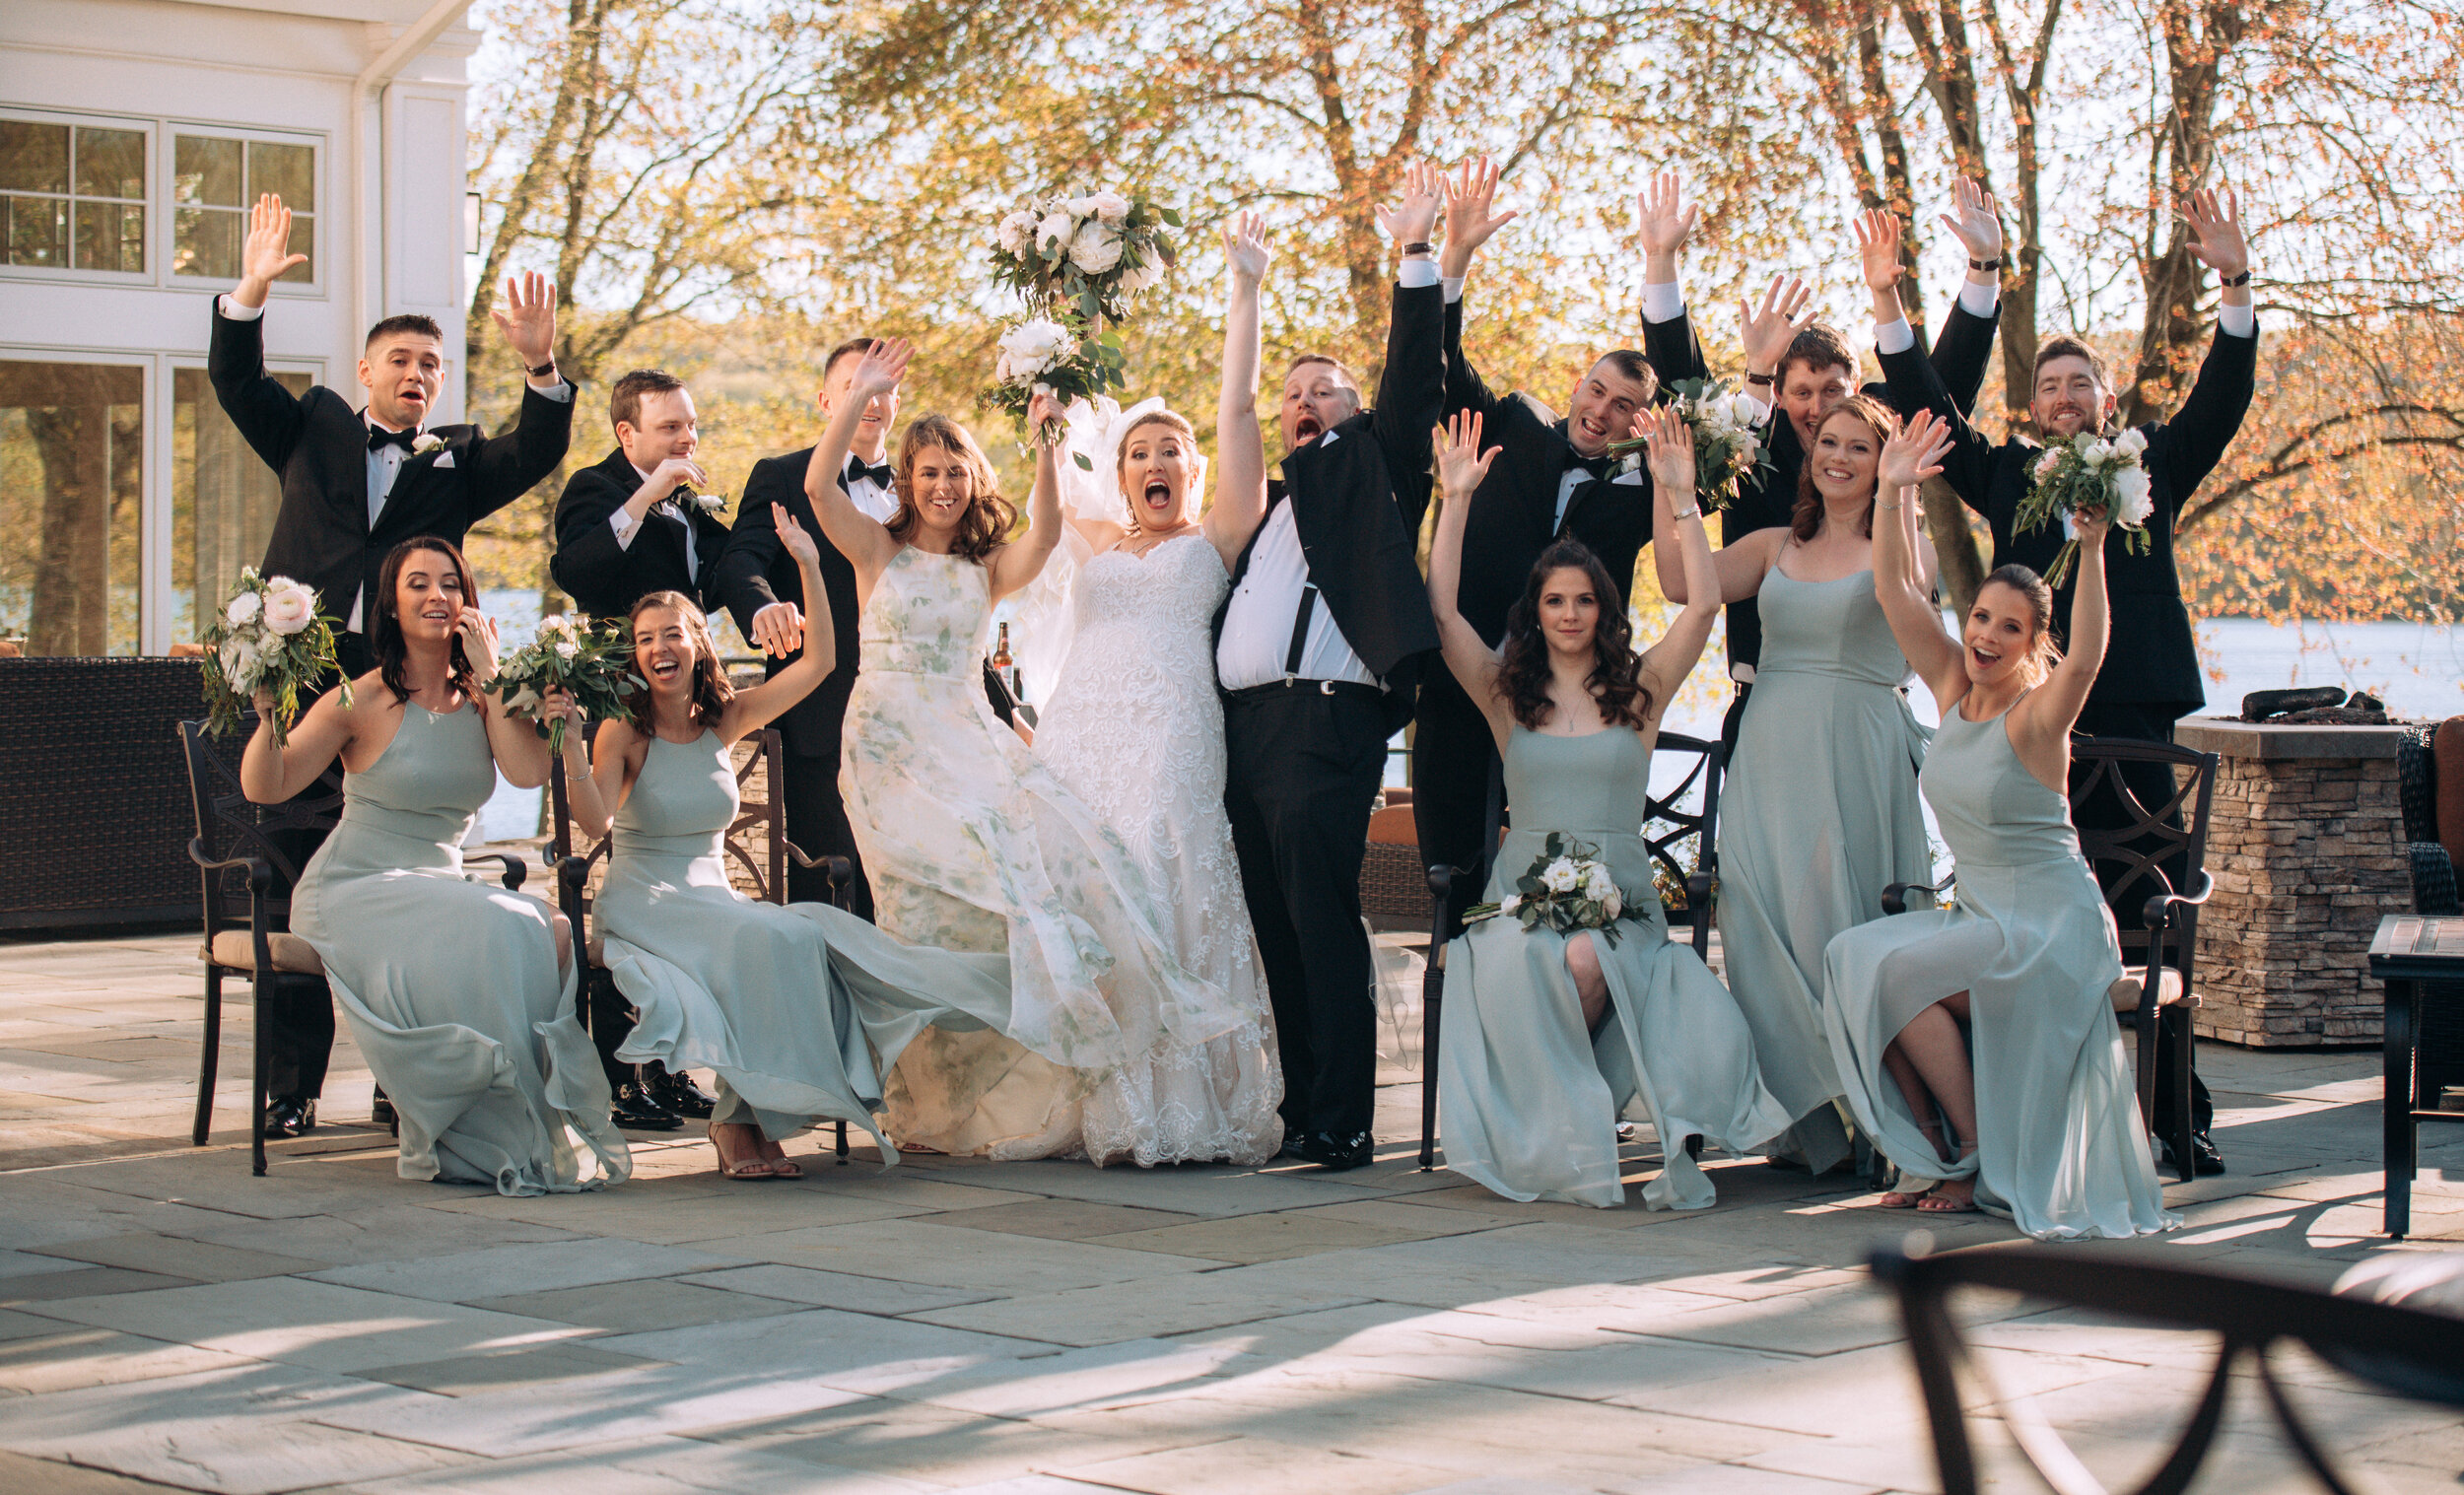 Rebecca Ingram Gowns-Savannah Weddings-Savannah Brides-Wedding Party-Bridesmaids-Sage-Lace Wedding Gown .jpg